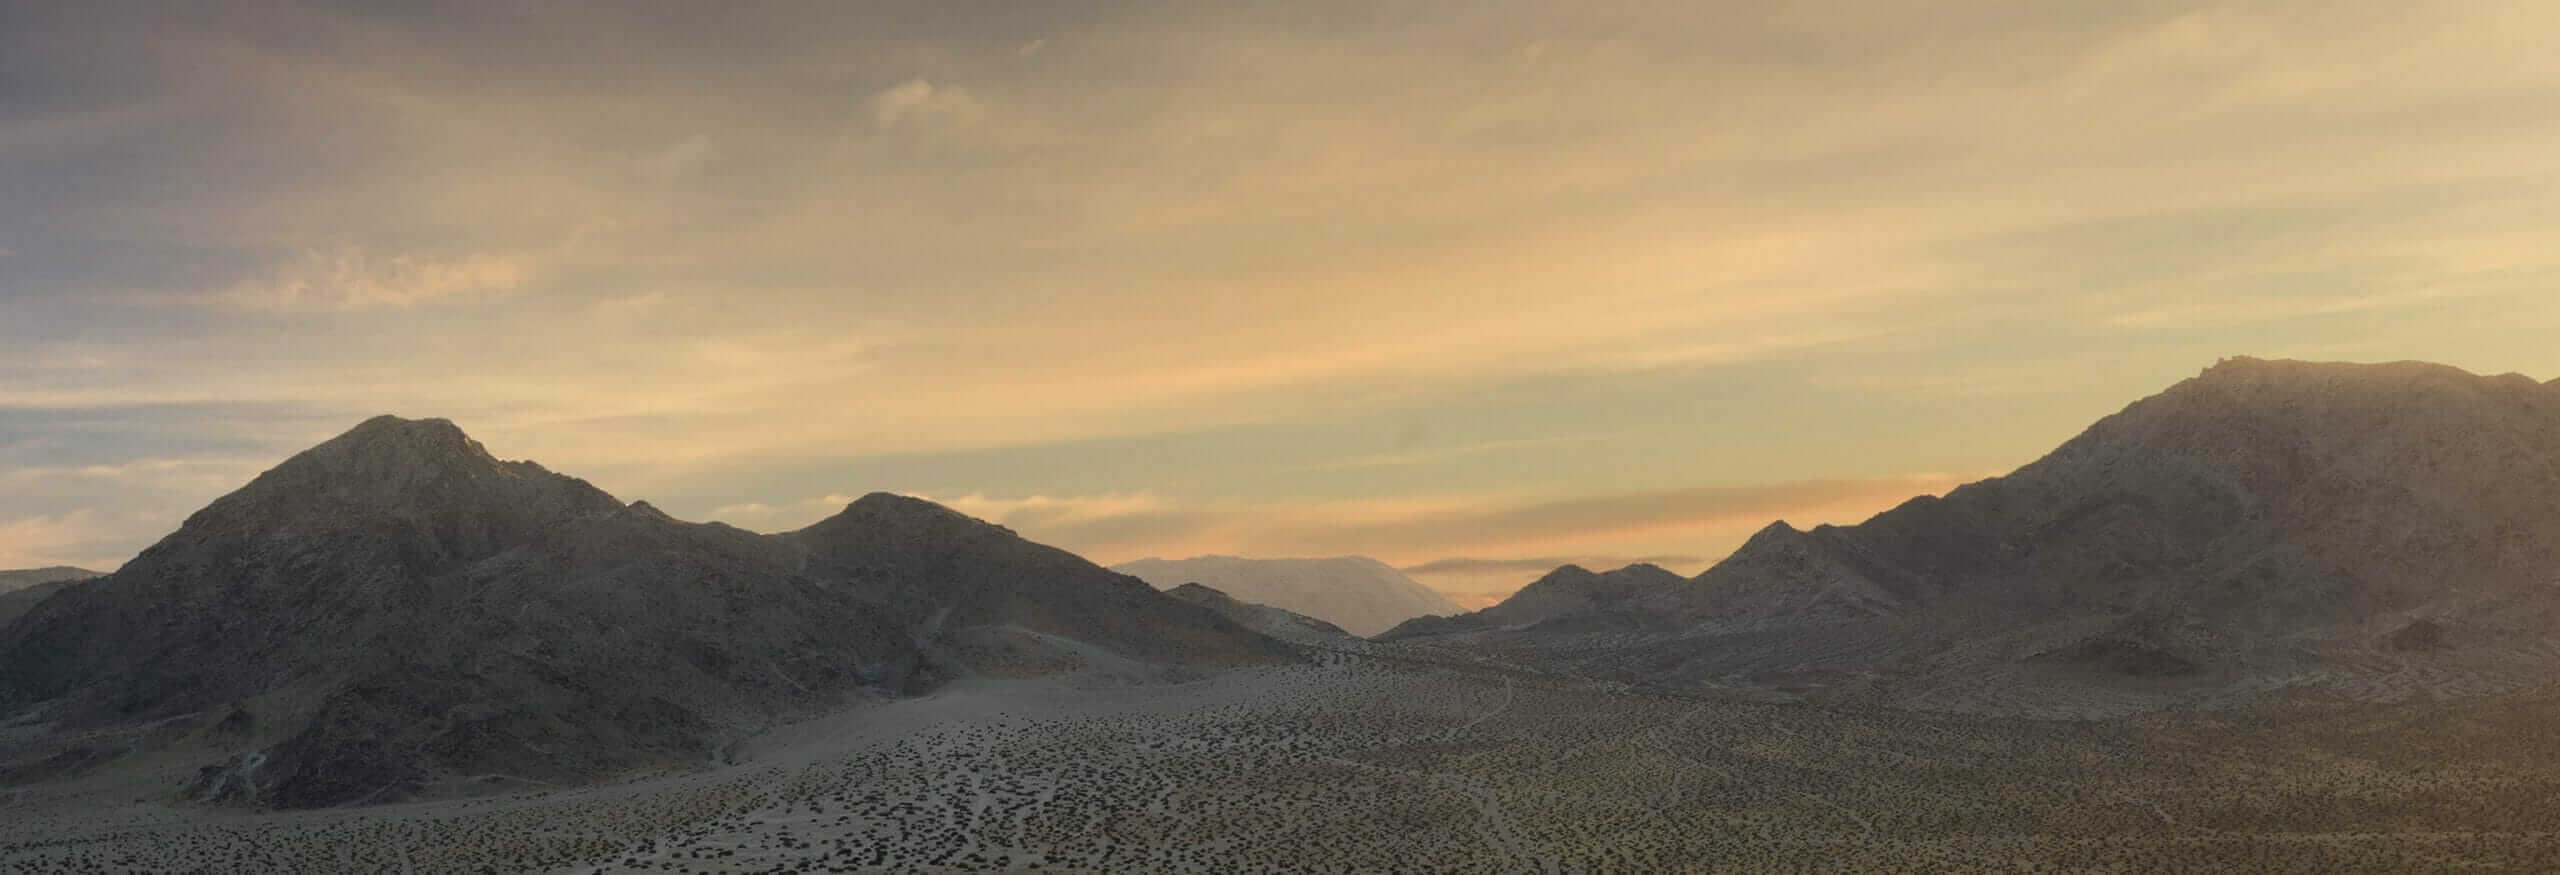 Mountain background for Conqueror MT